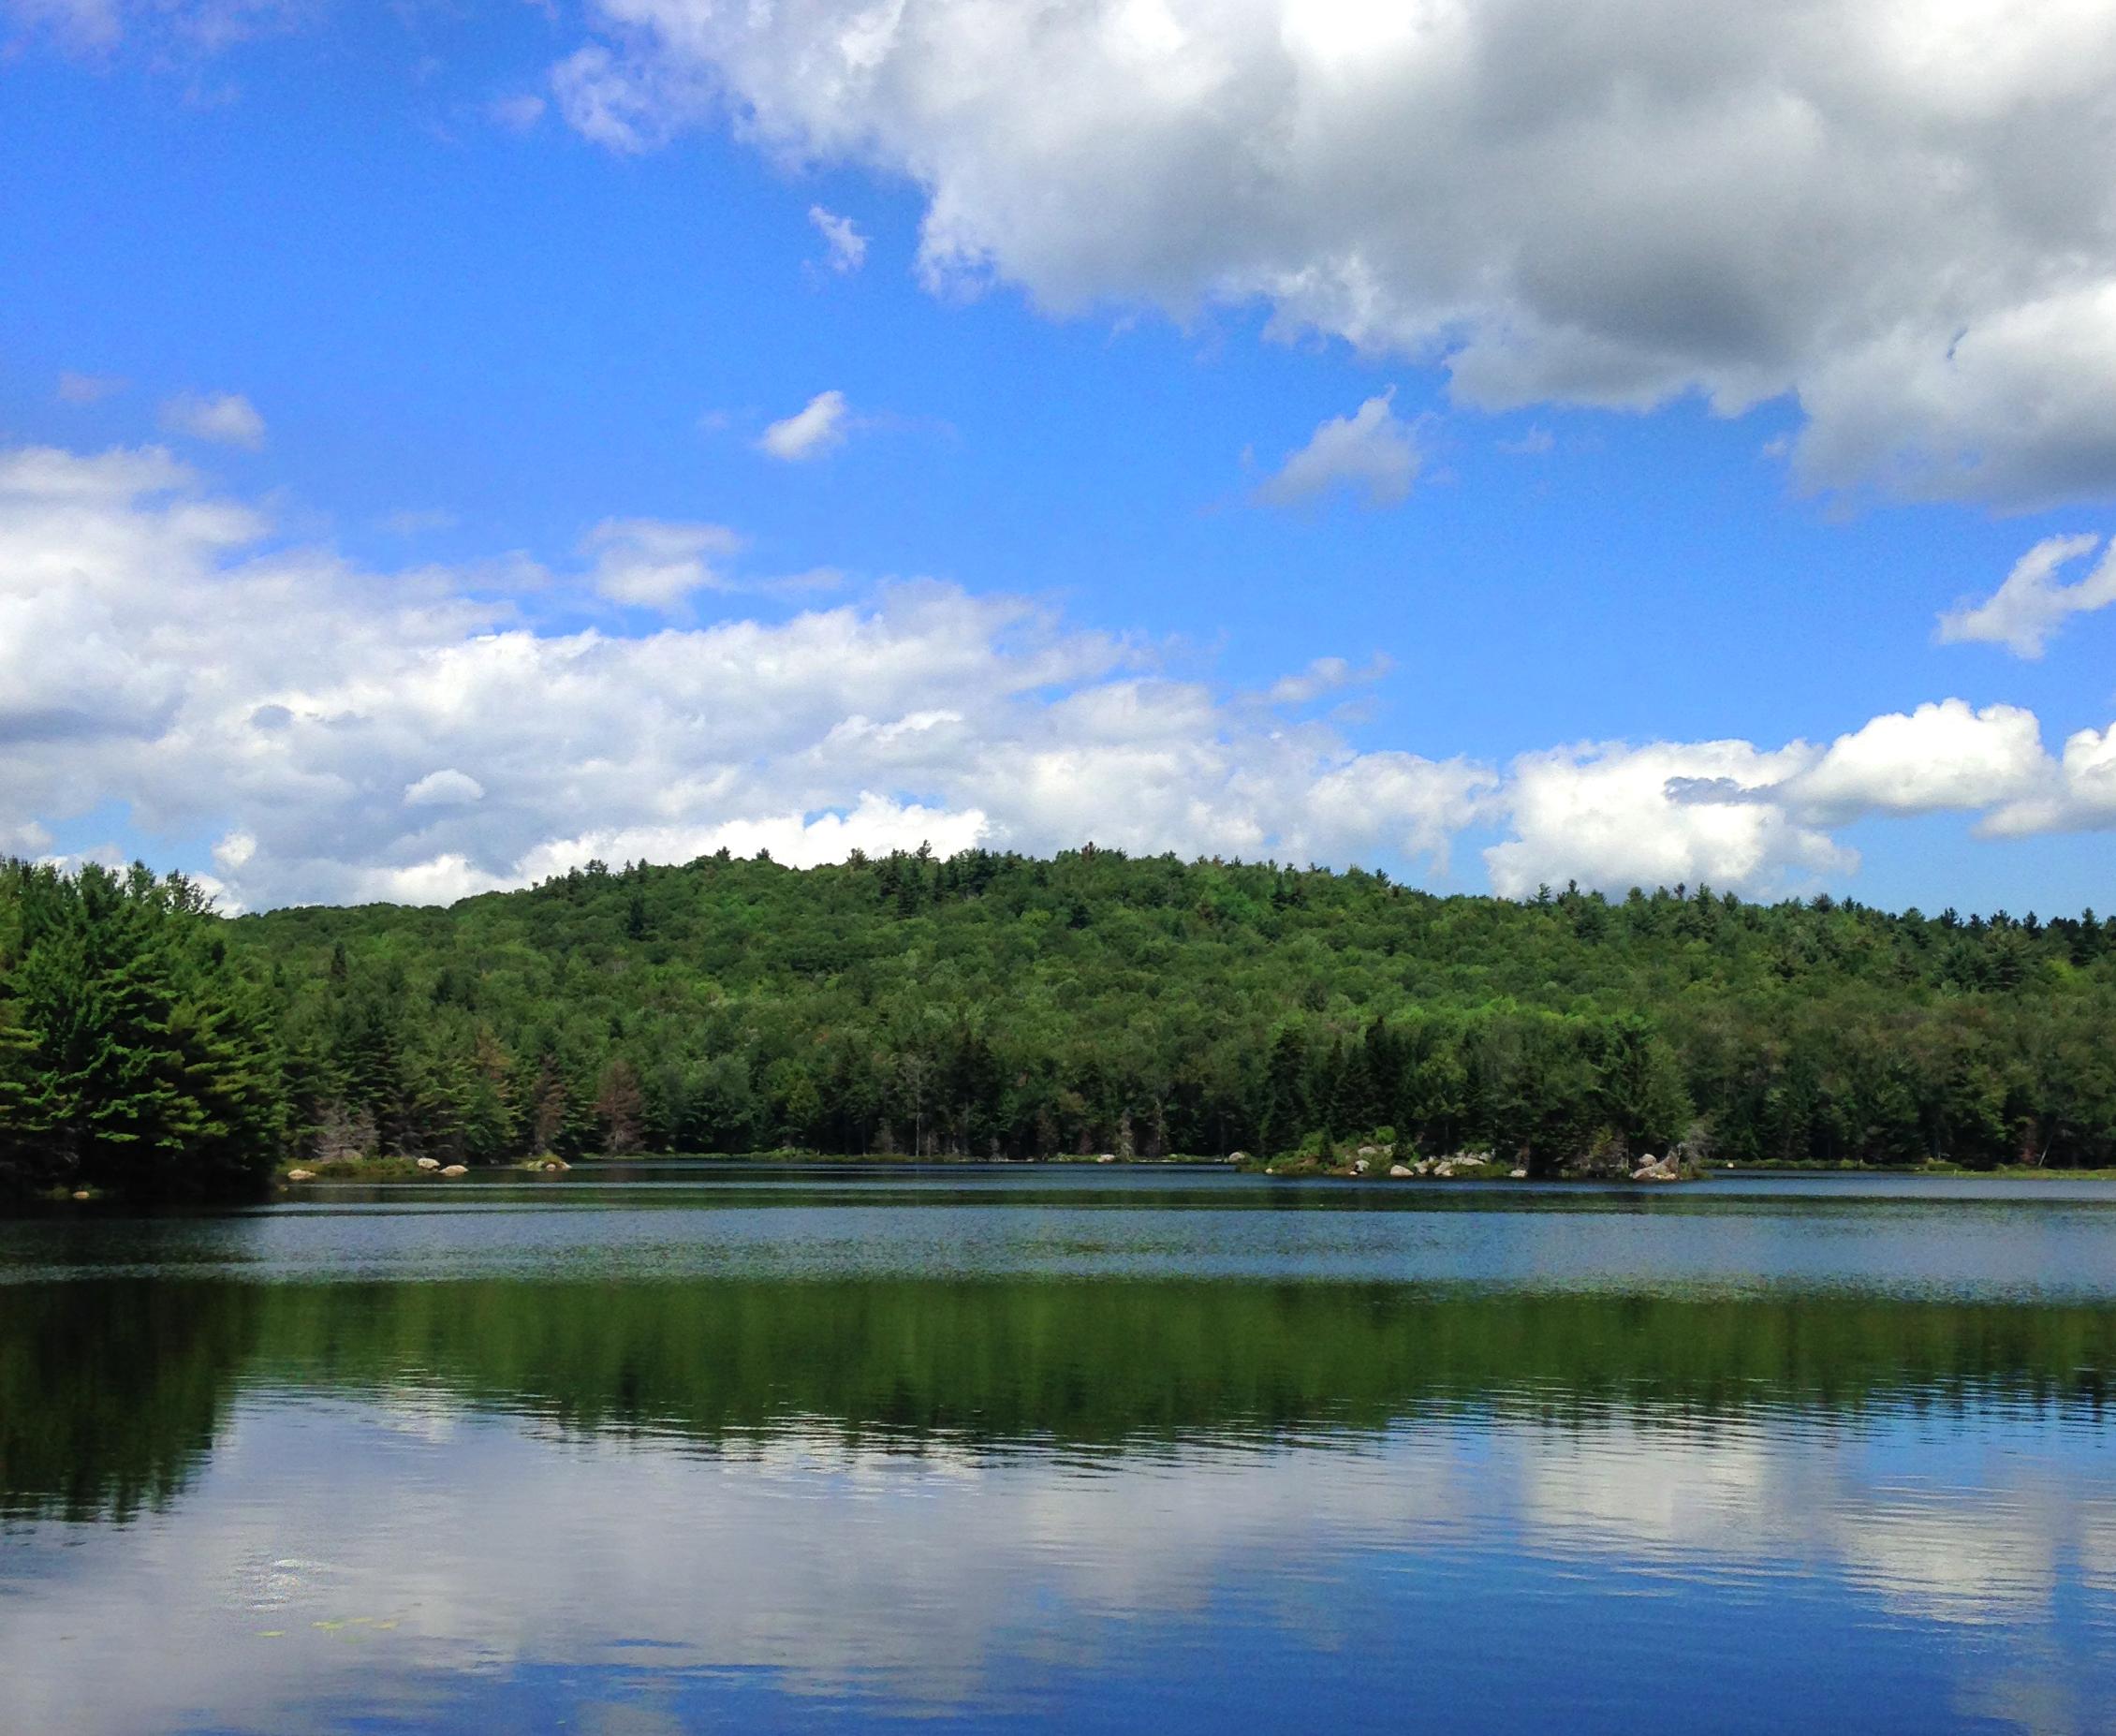 bregani_adria_pioneer_lake.jpg